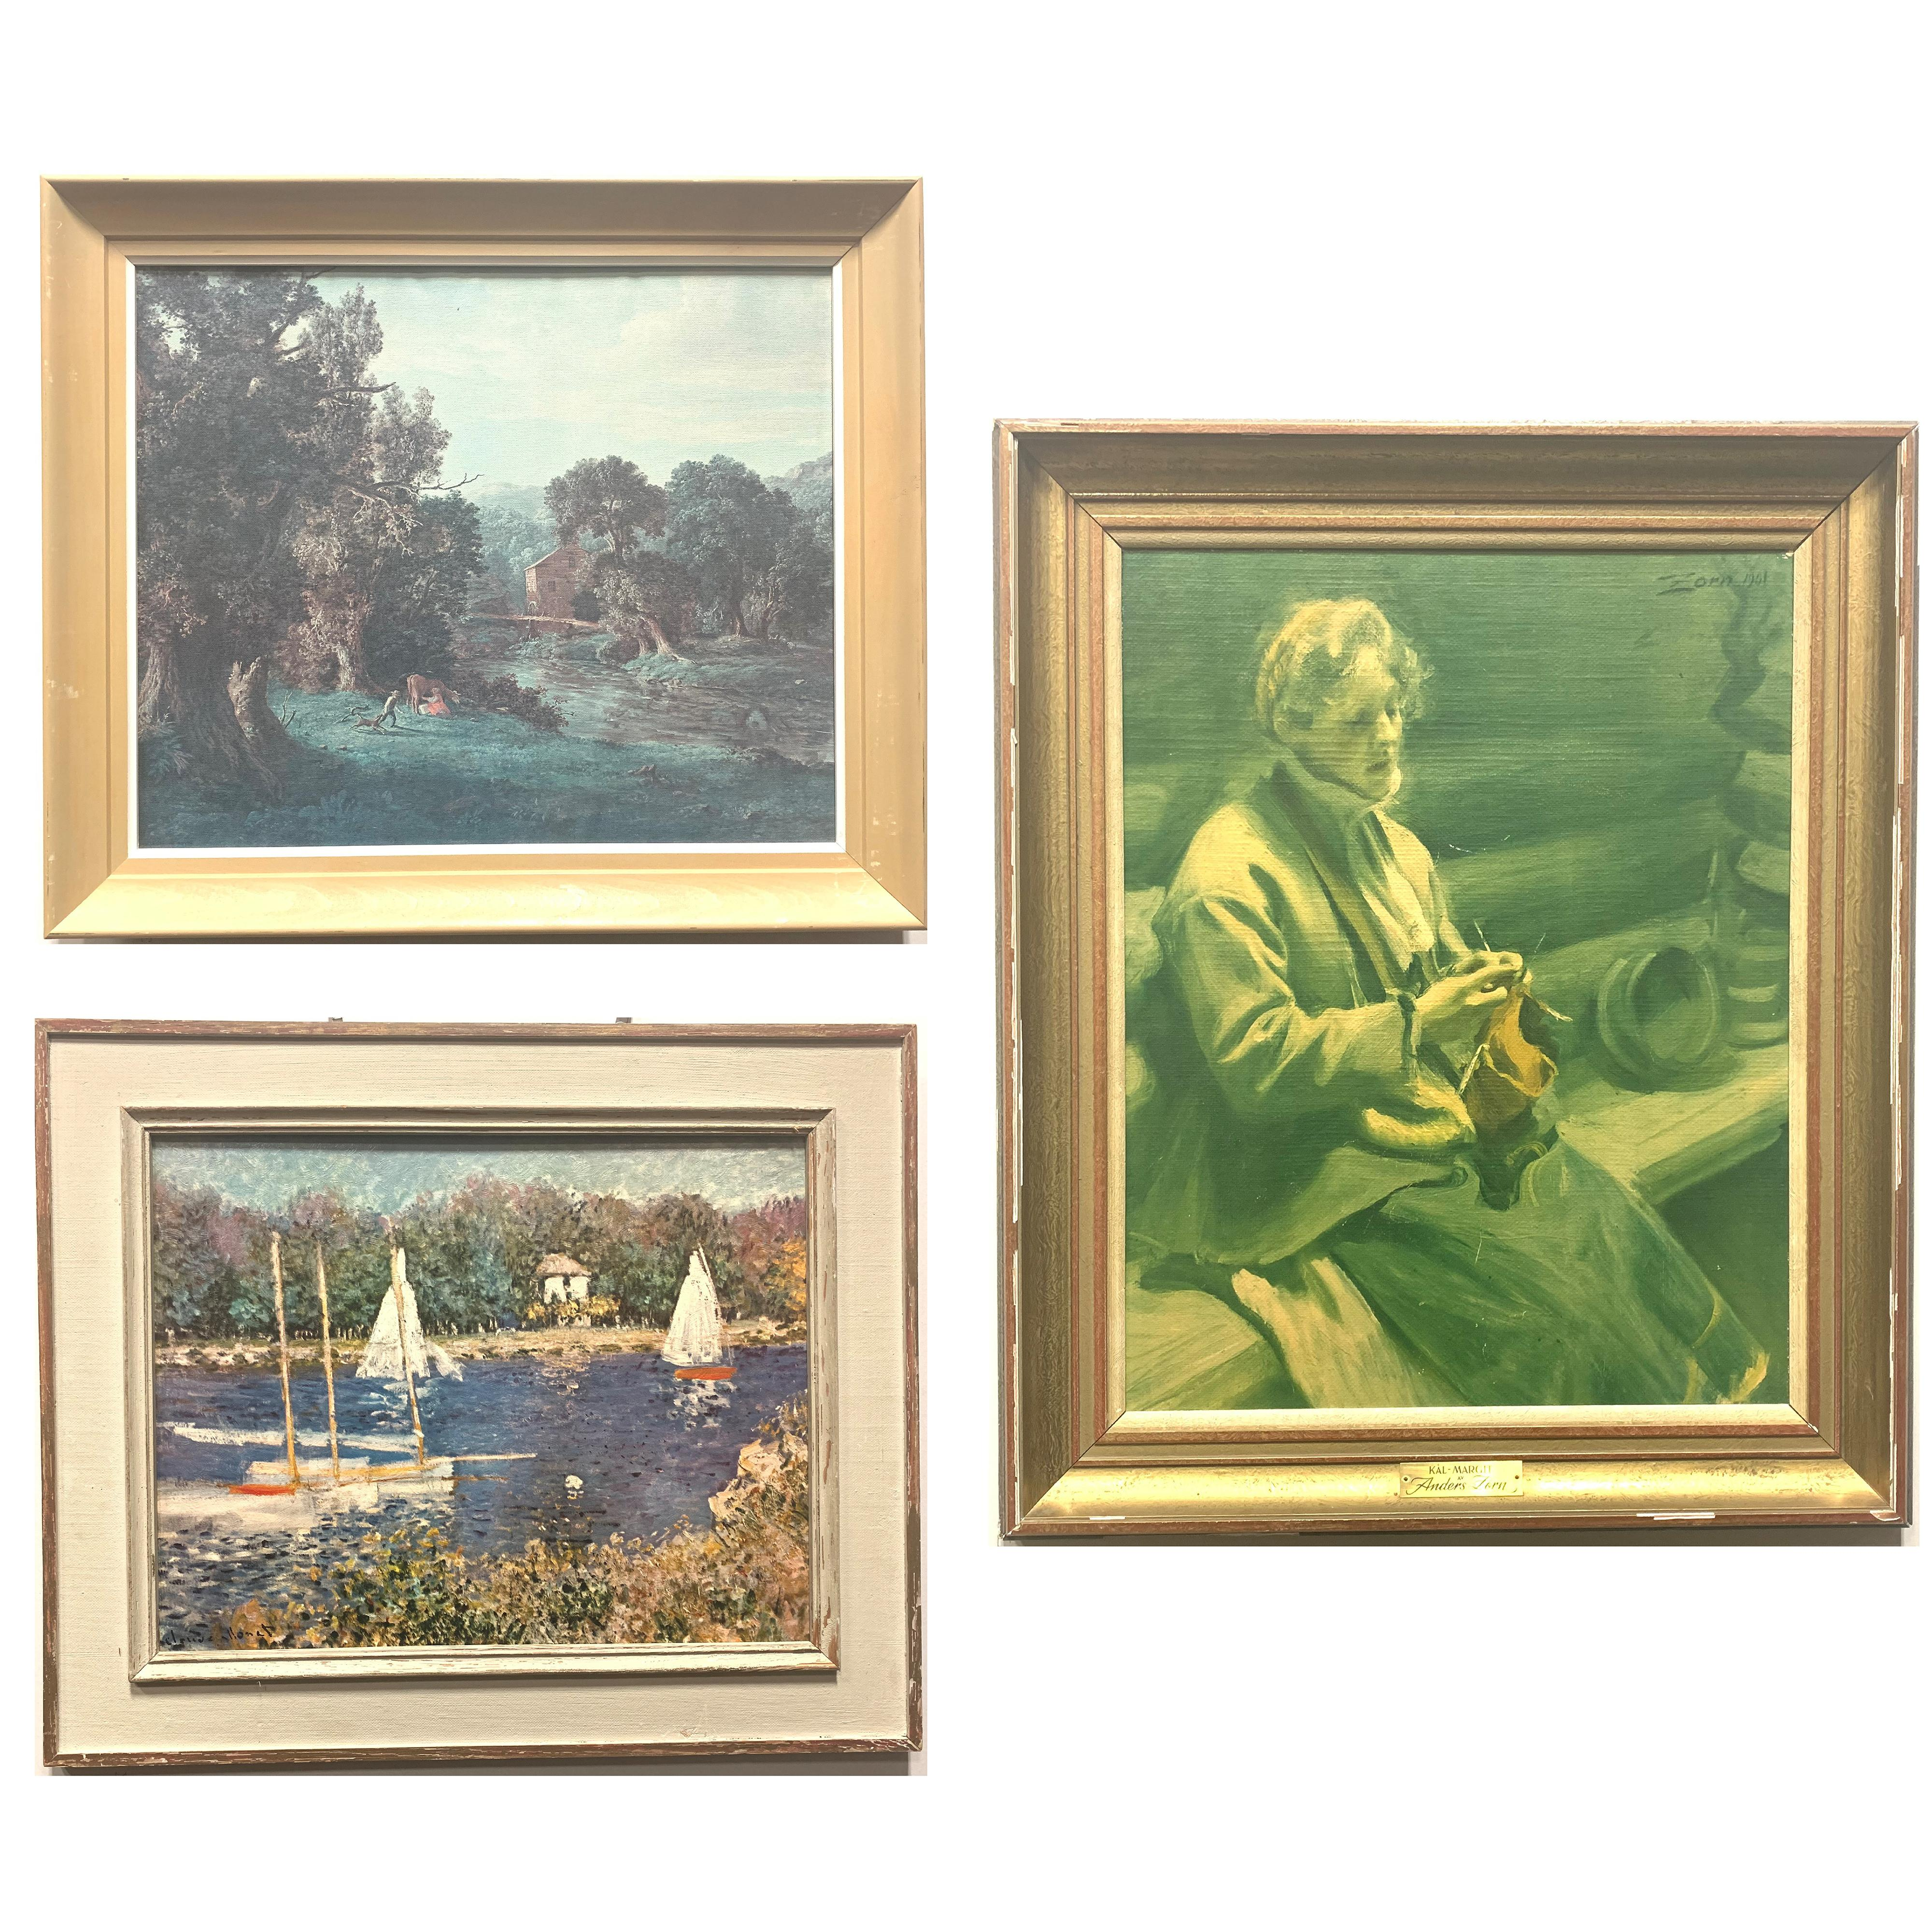 Set of 3 Pieces of Framed Art